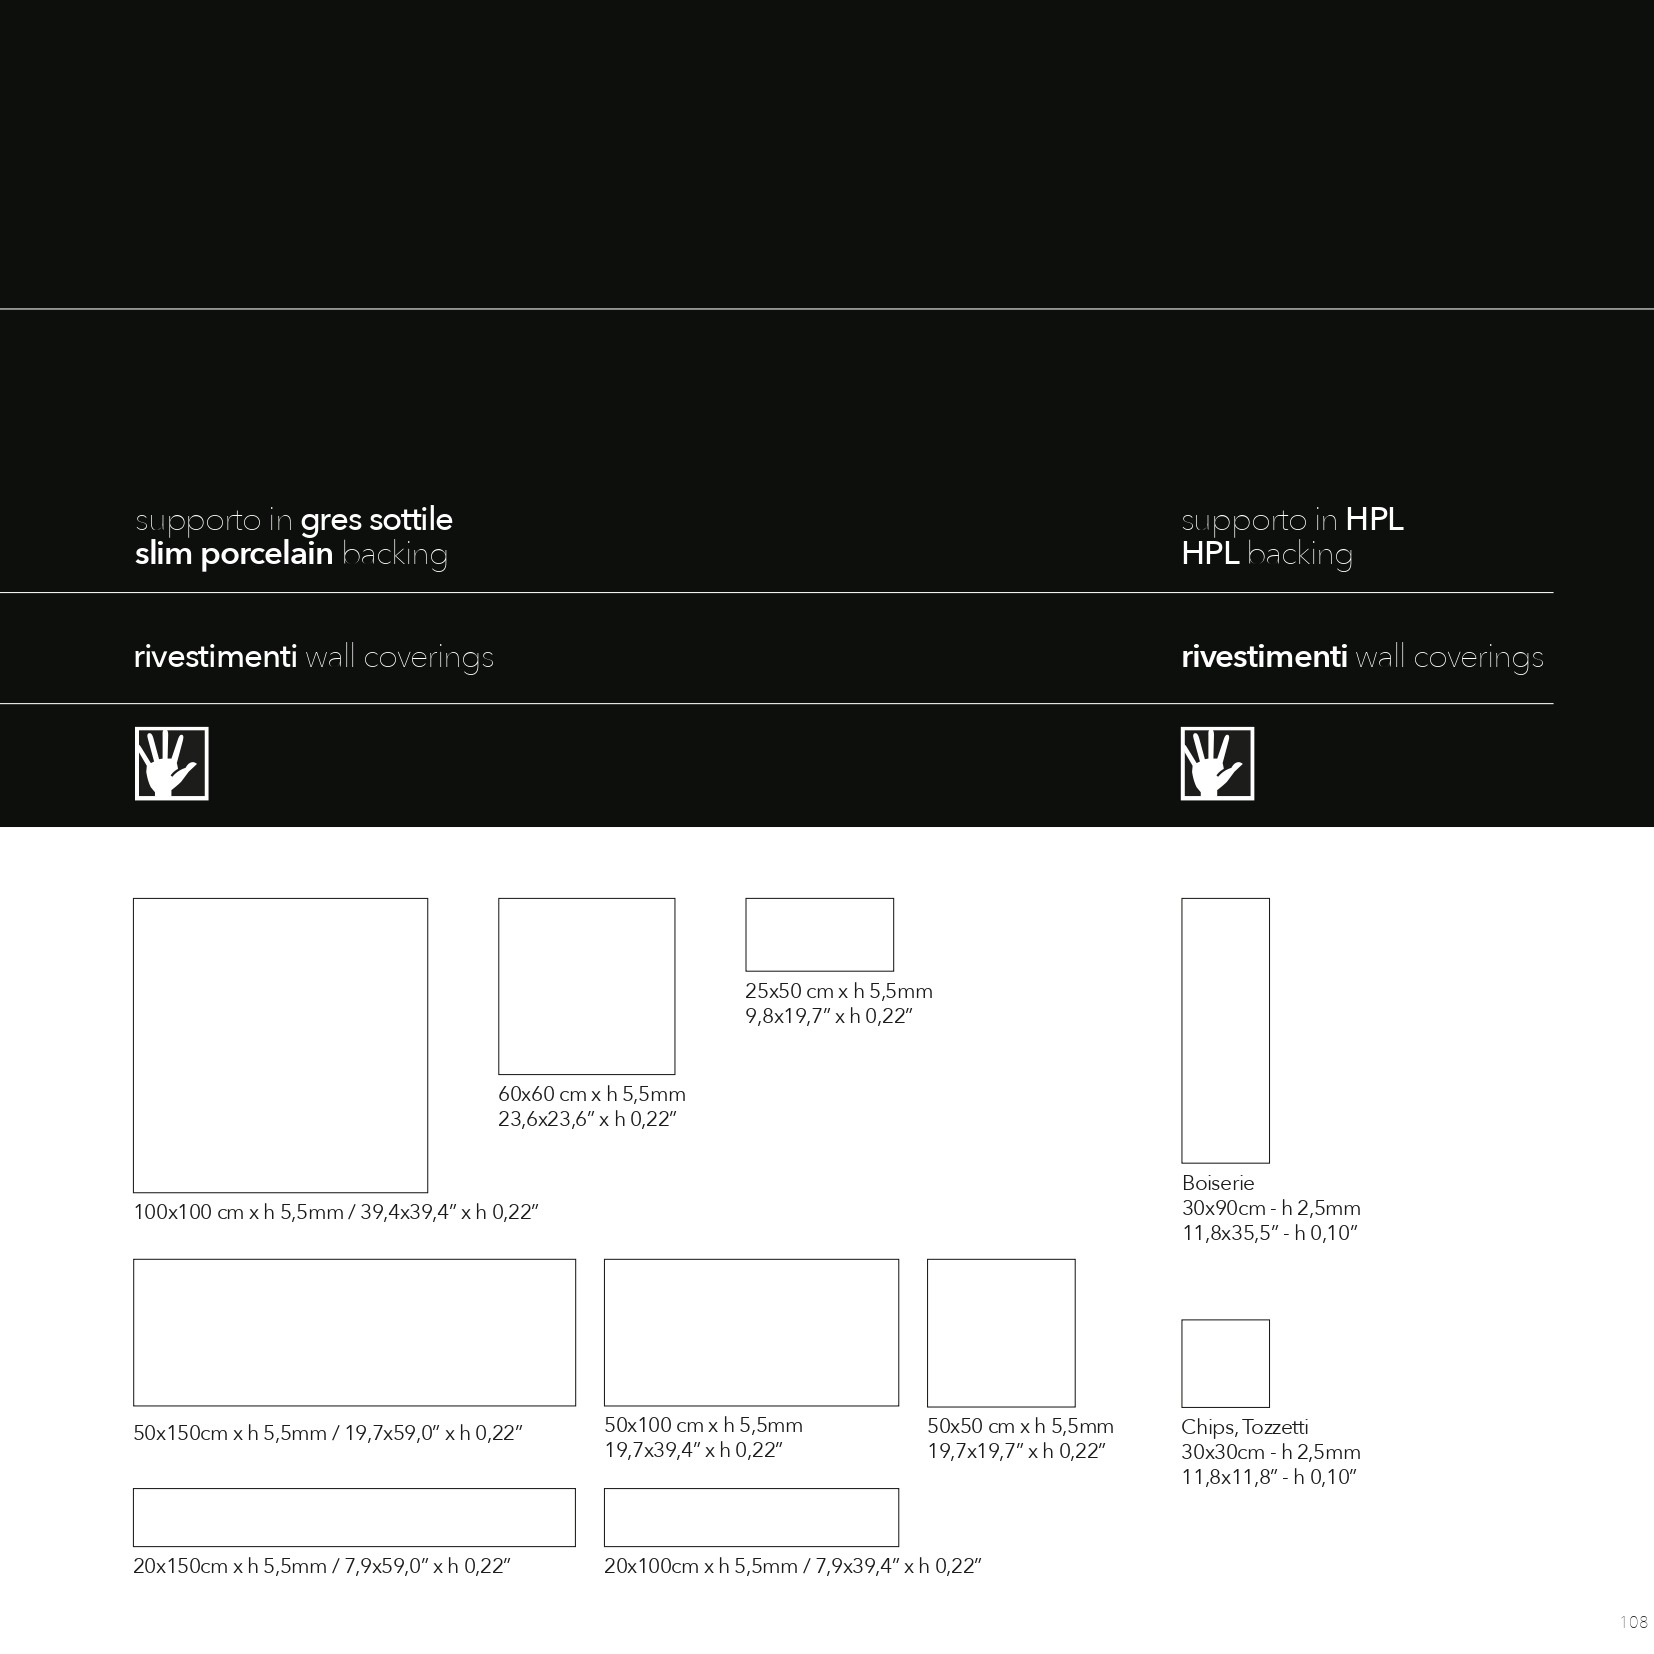 https://lartedellapelle.com/wp-content/uploads/2021/07/Nextep-2018_digital_page-0108.jpg